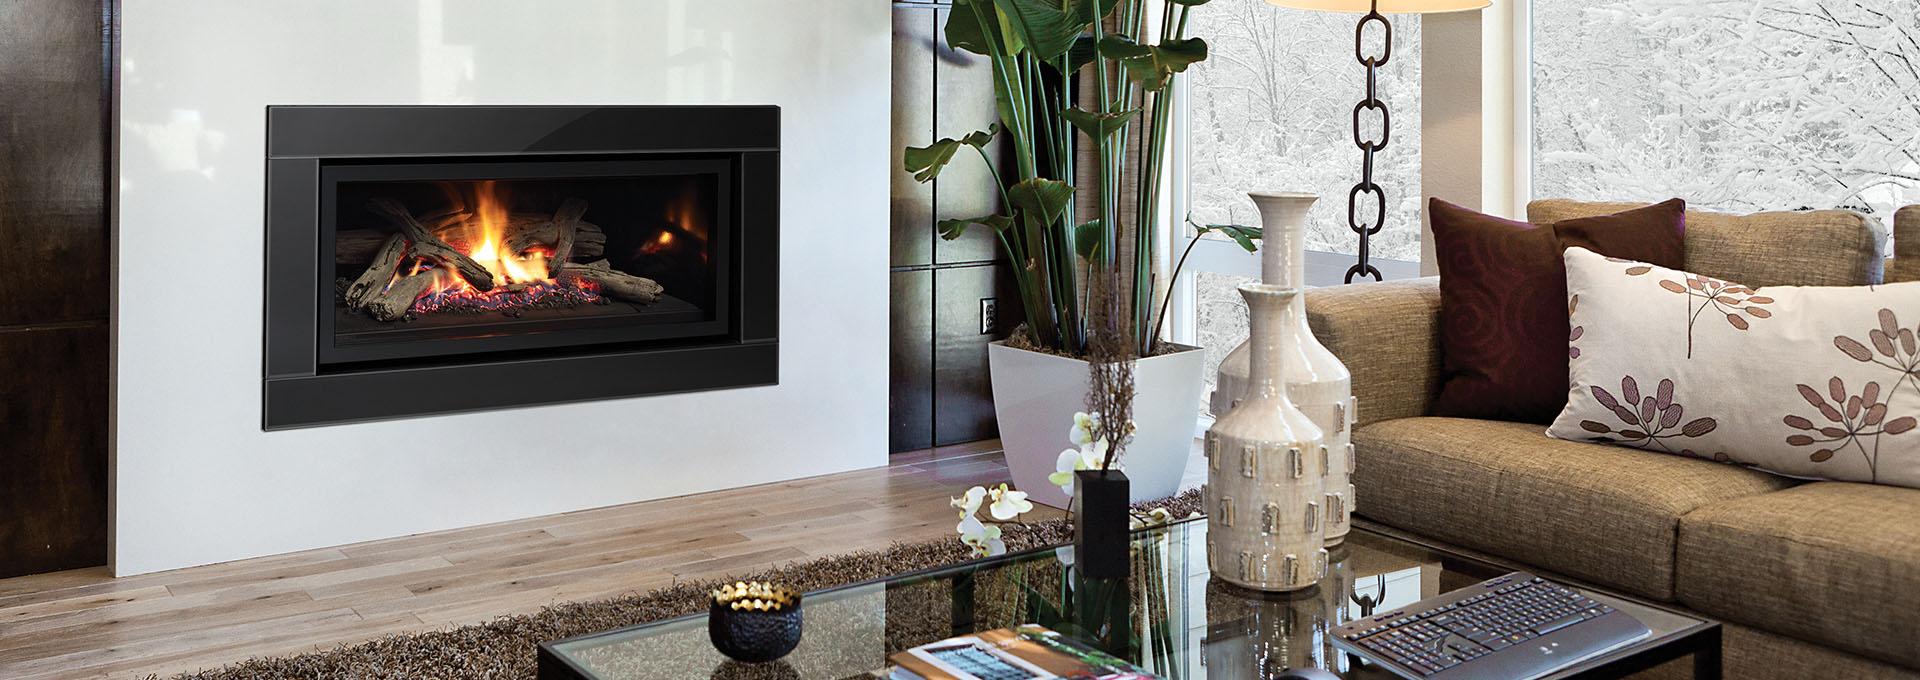 Photo of the Regency U900E Fireplace.